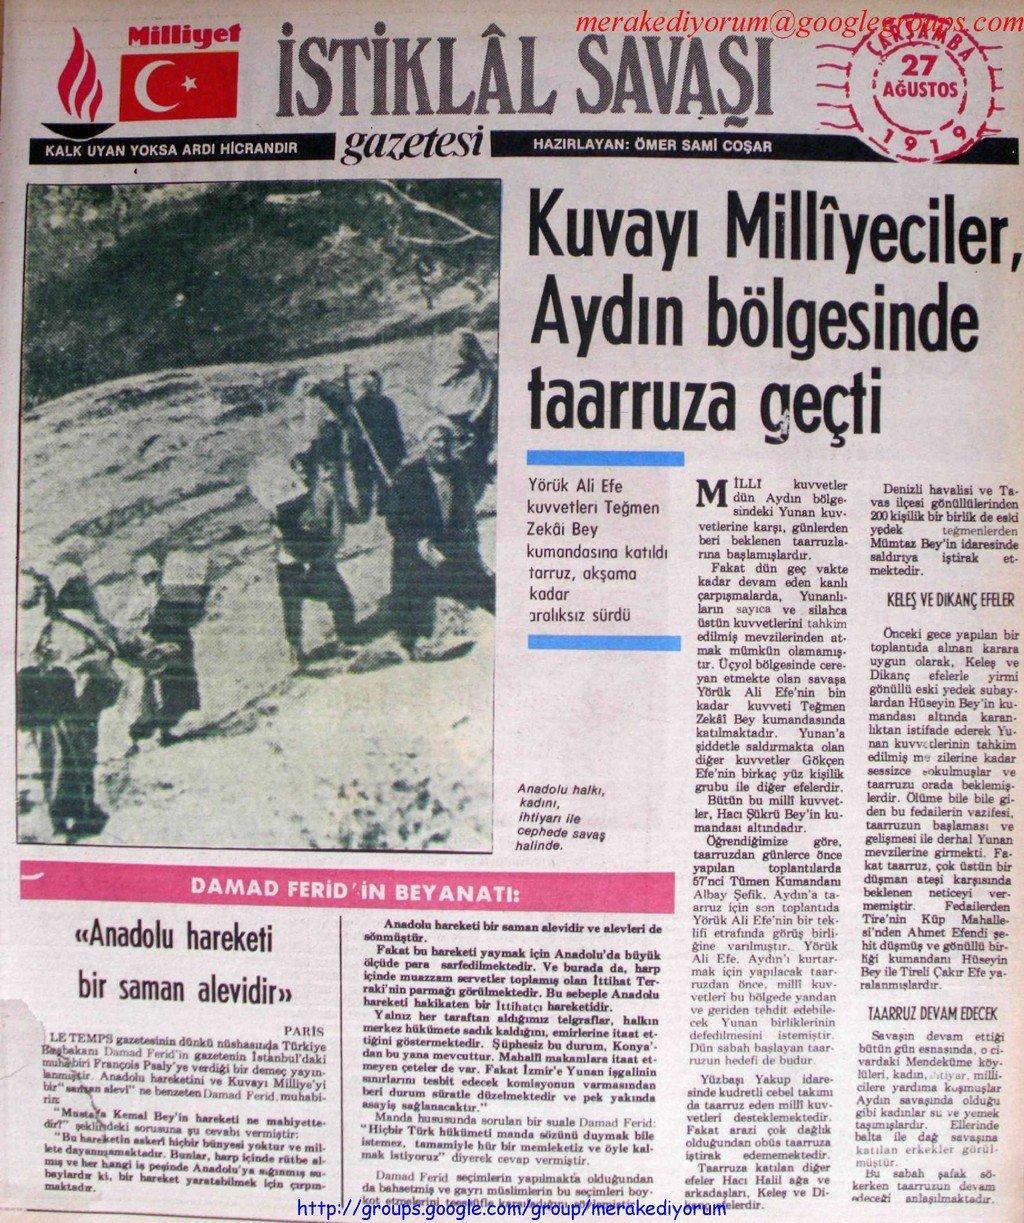 istiklal savaşı gazetesi - 27 ağustos 1919